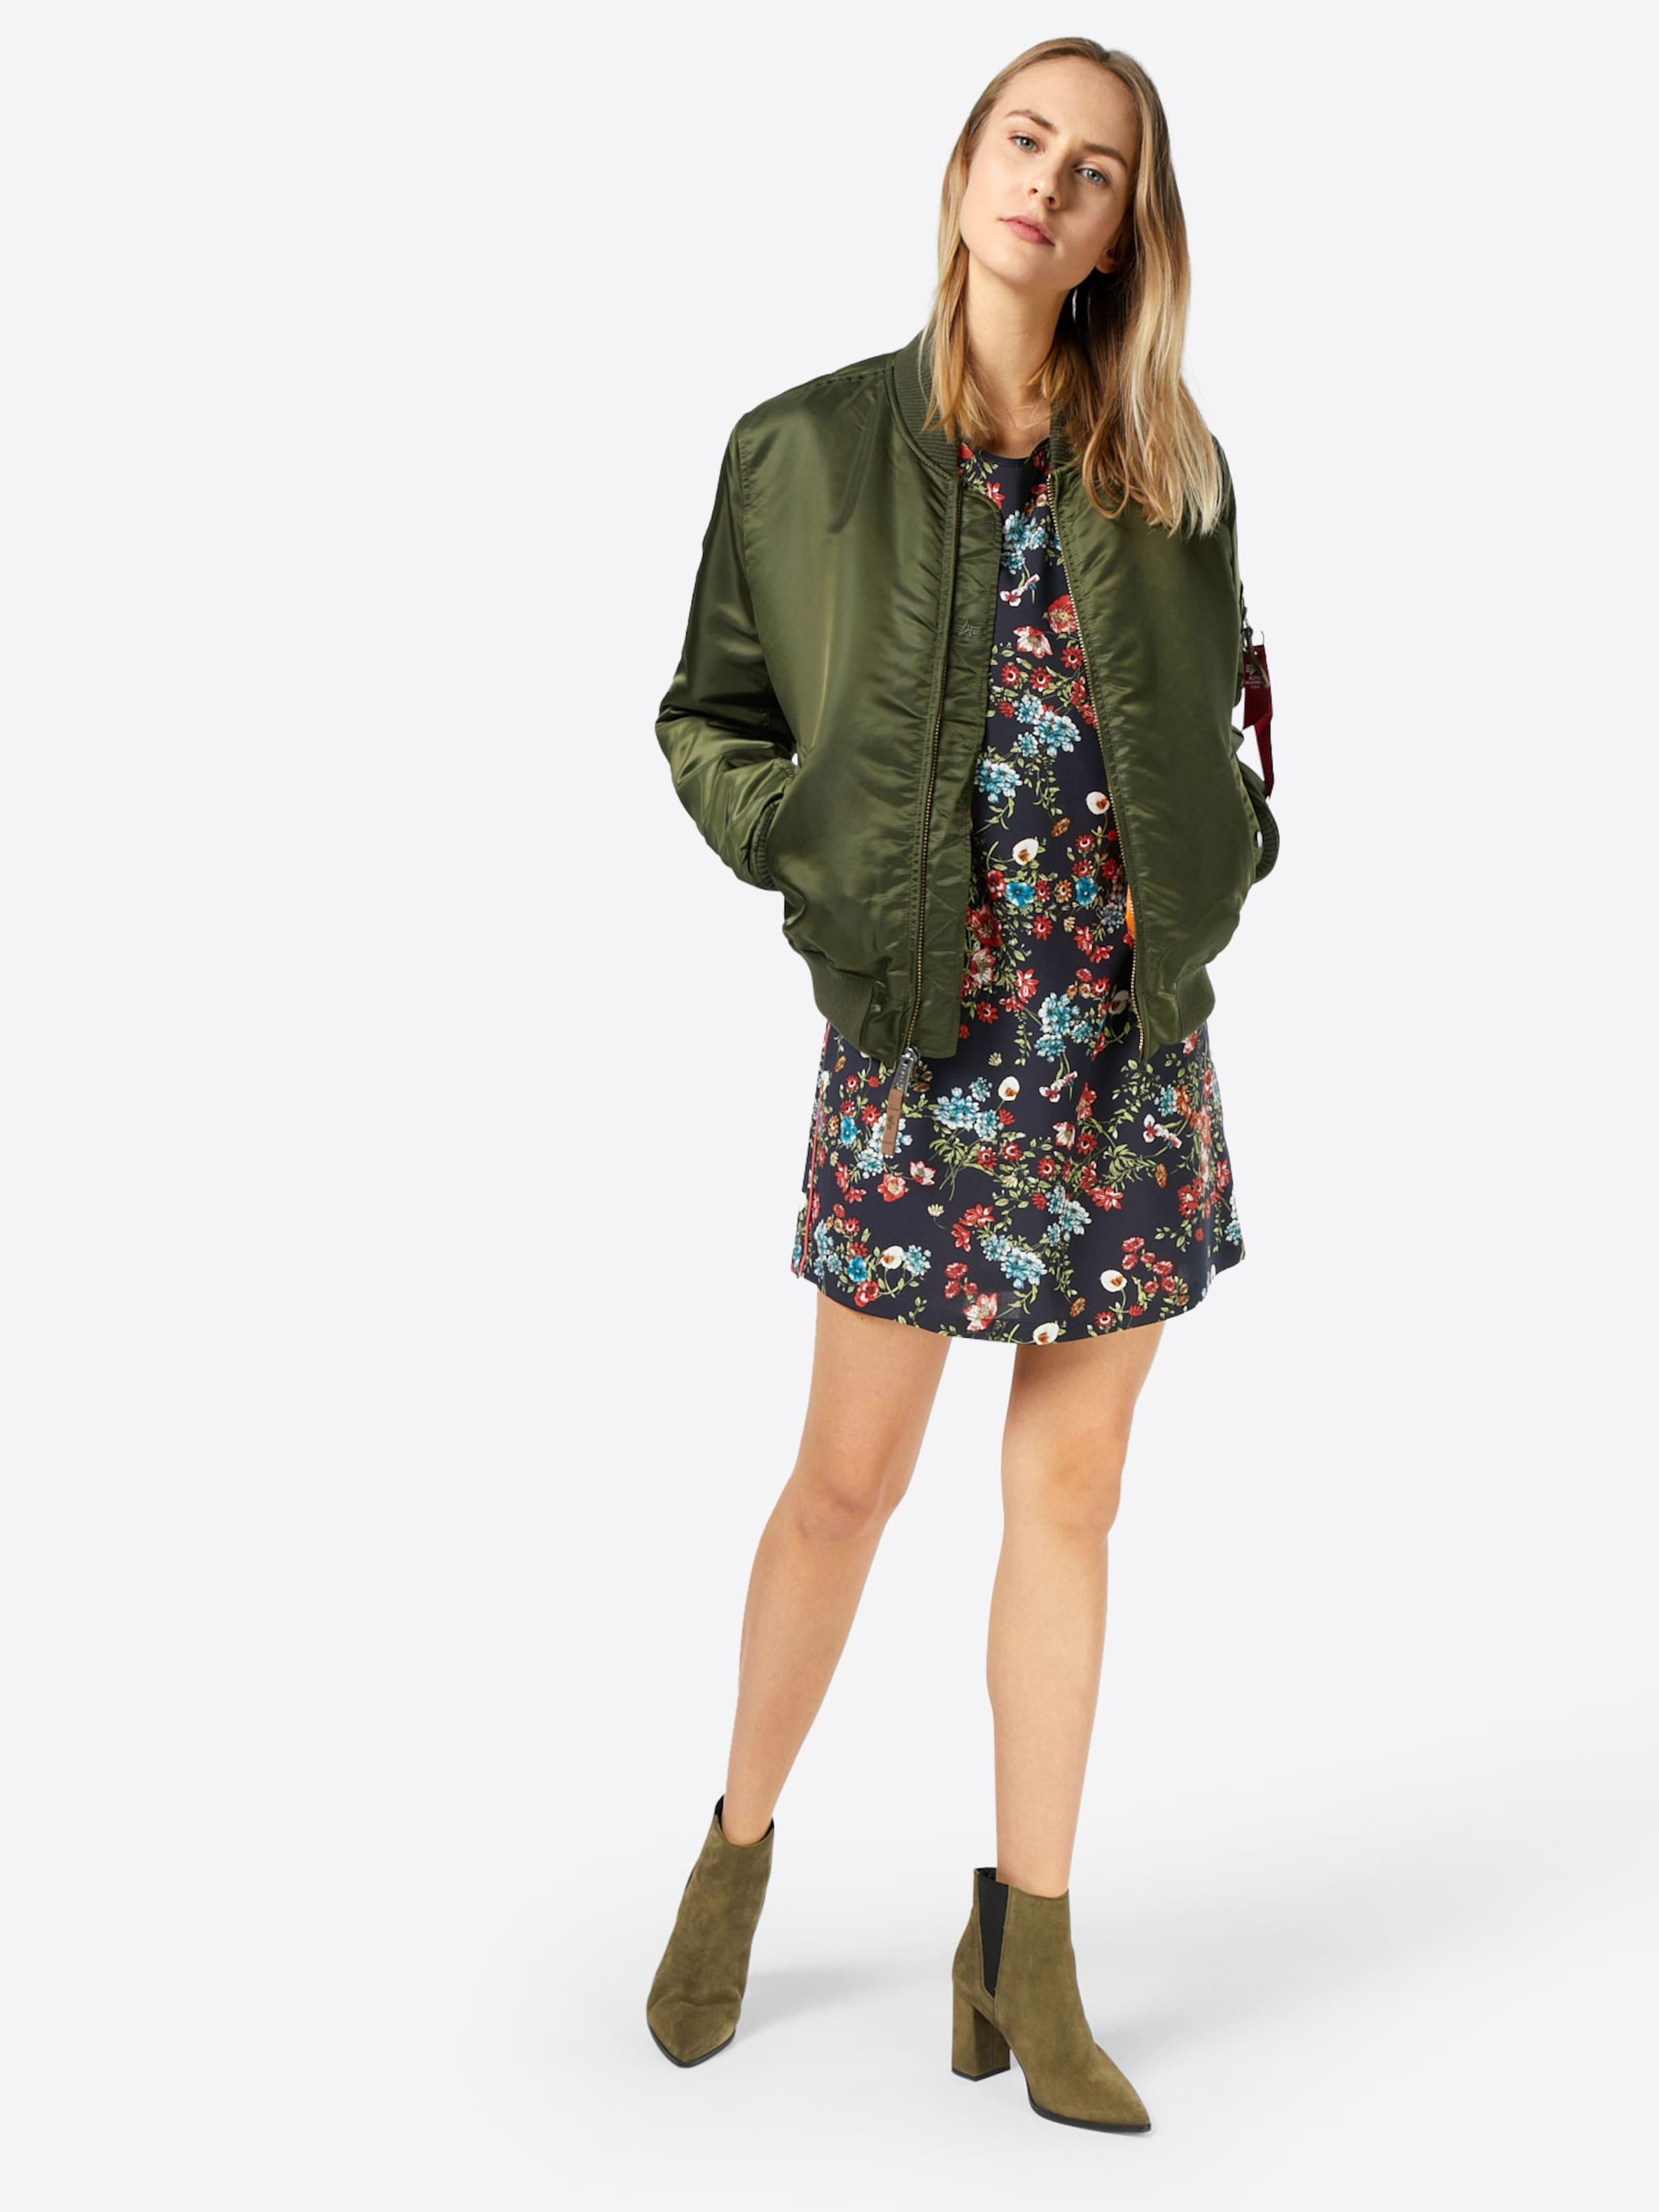 ONLY Kleid 'onlCASA AOP VIS' Drop-Shipping Erkunden Günstig Online Günstig Kaufen Rabatt vuJvEQaeW1